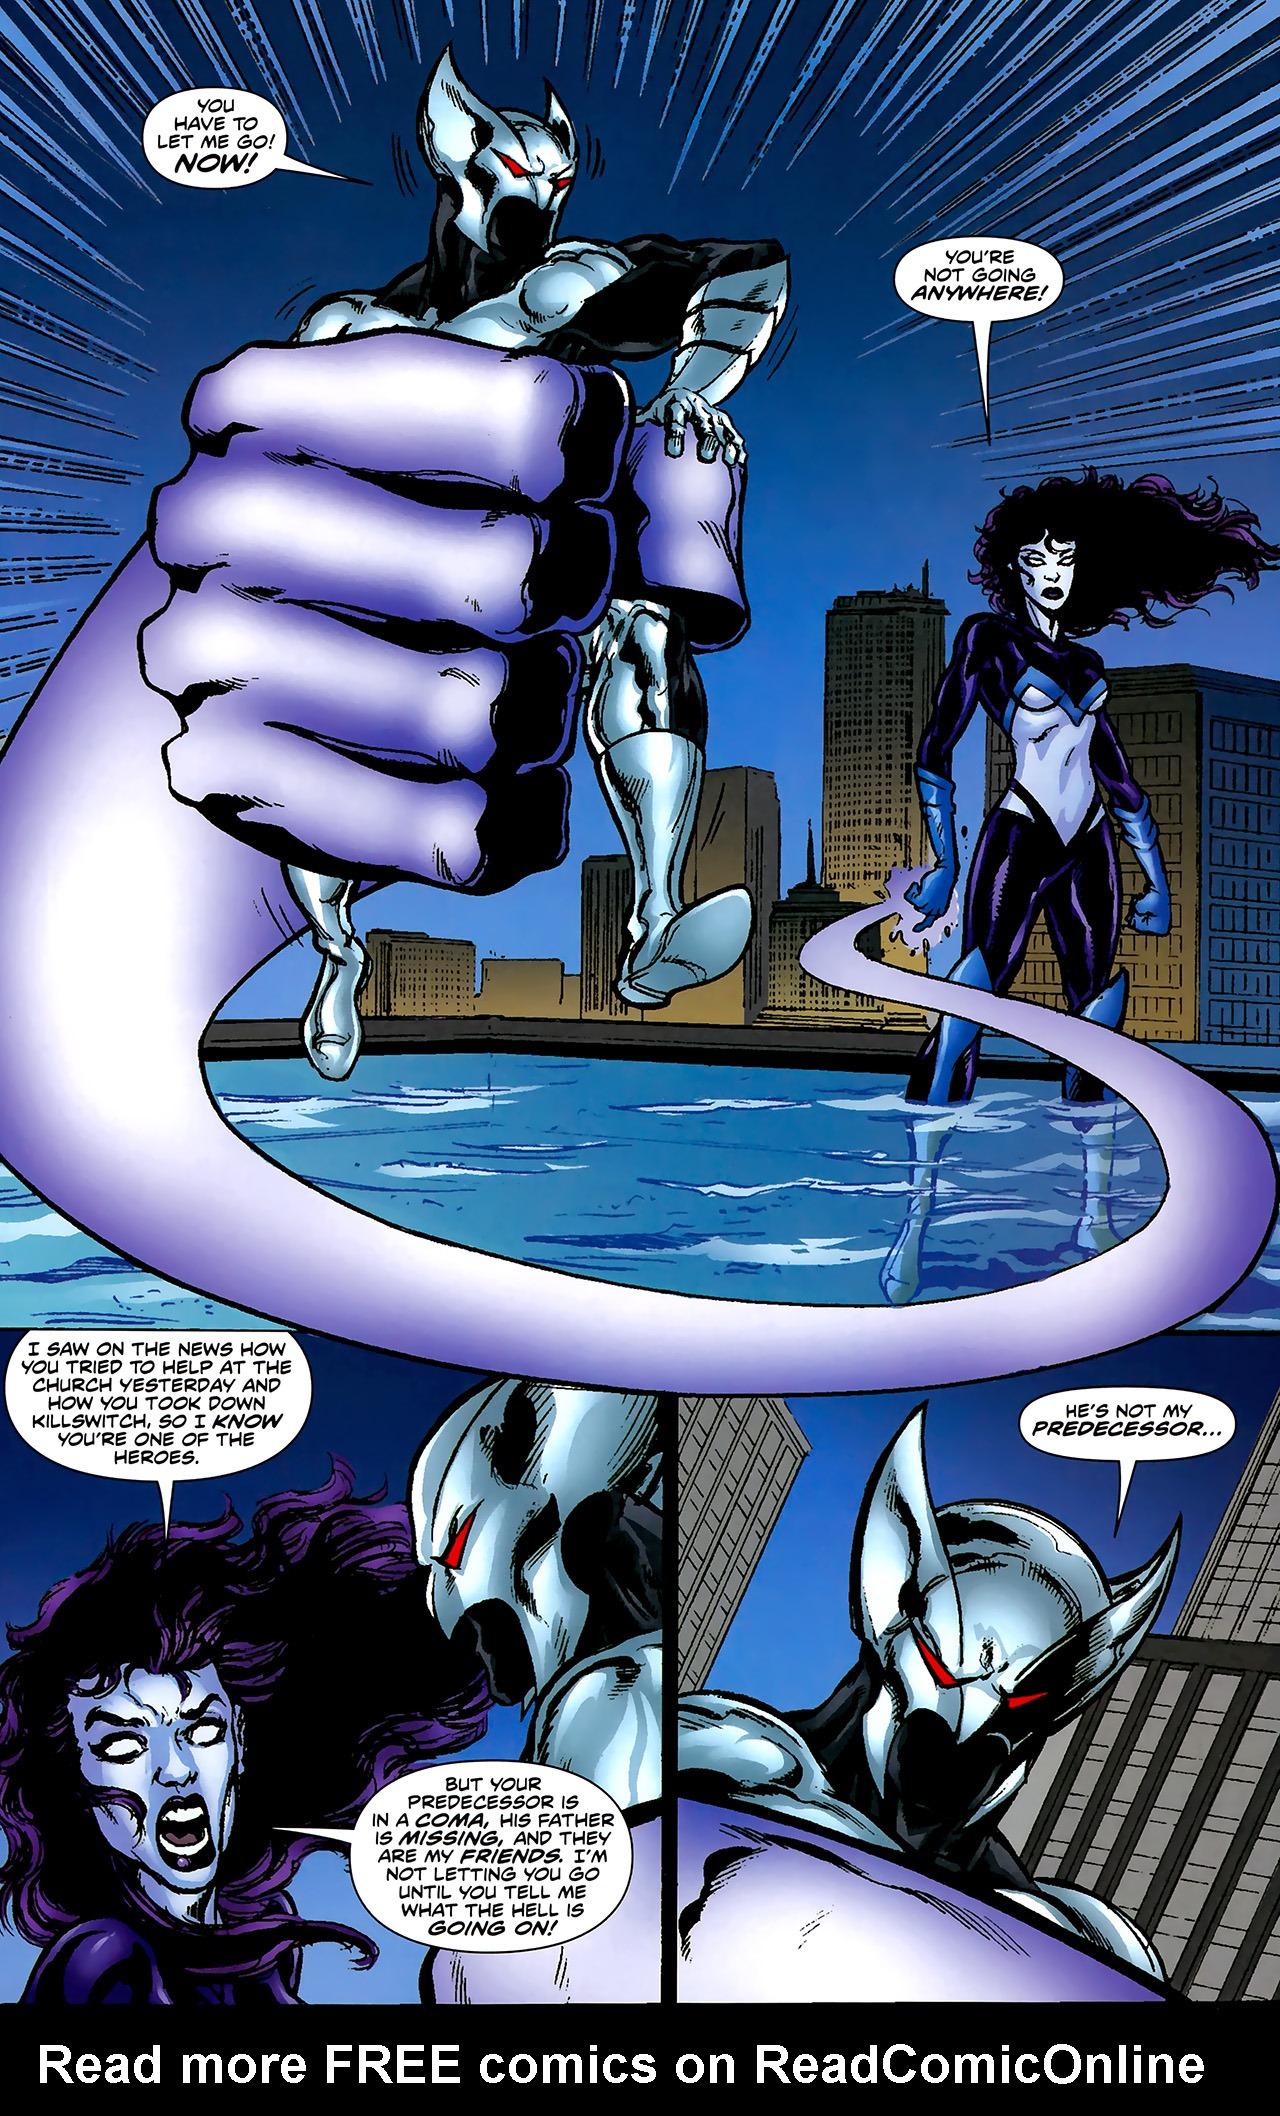 Read online ShadowHawk (2010) comic -  Issue #2 - 14